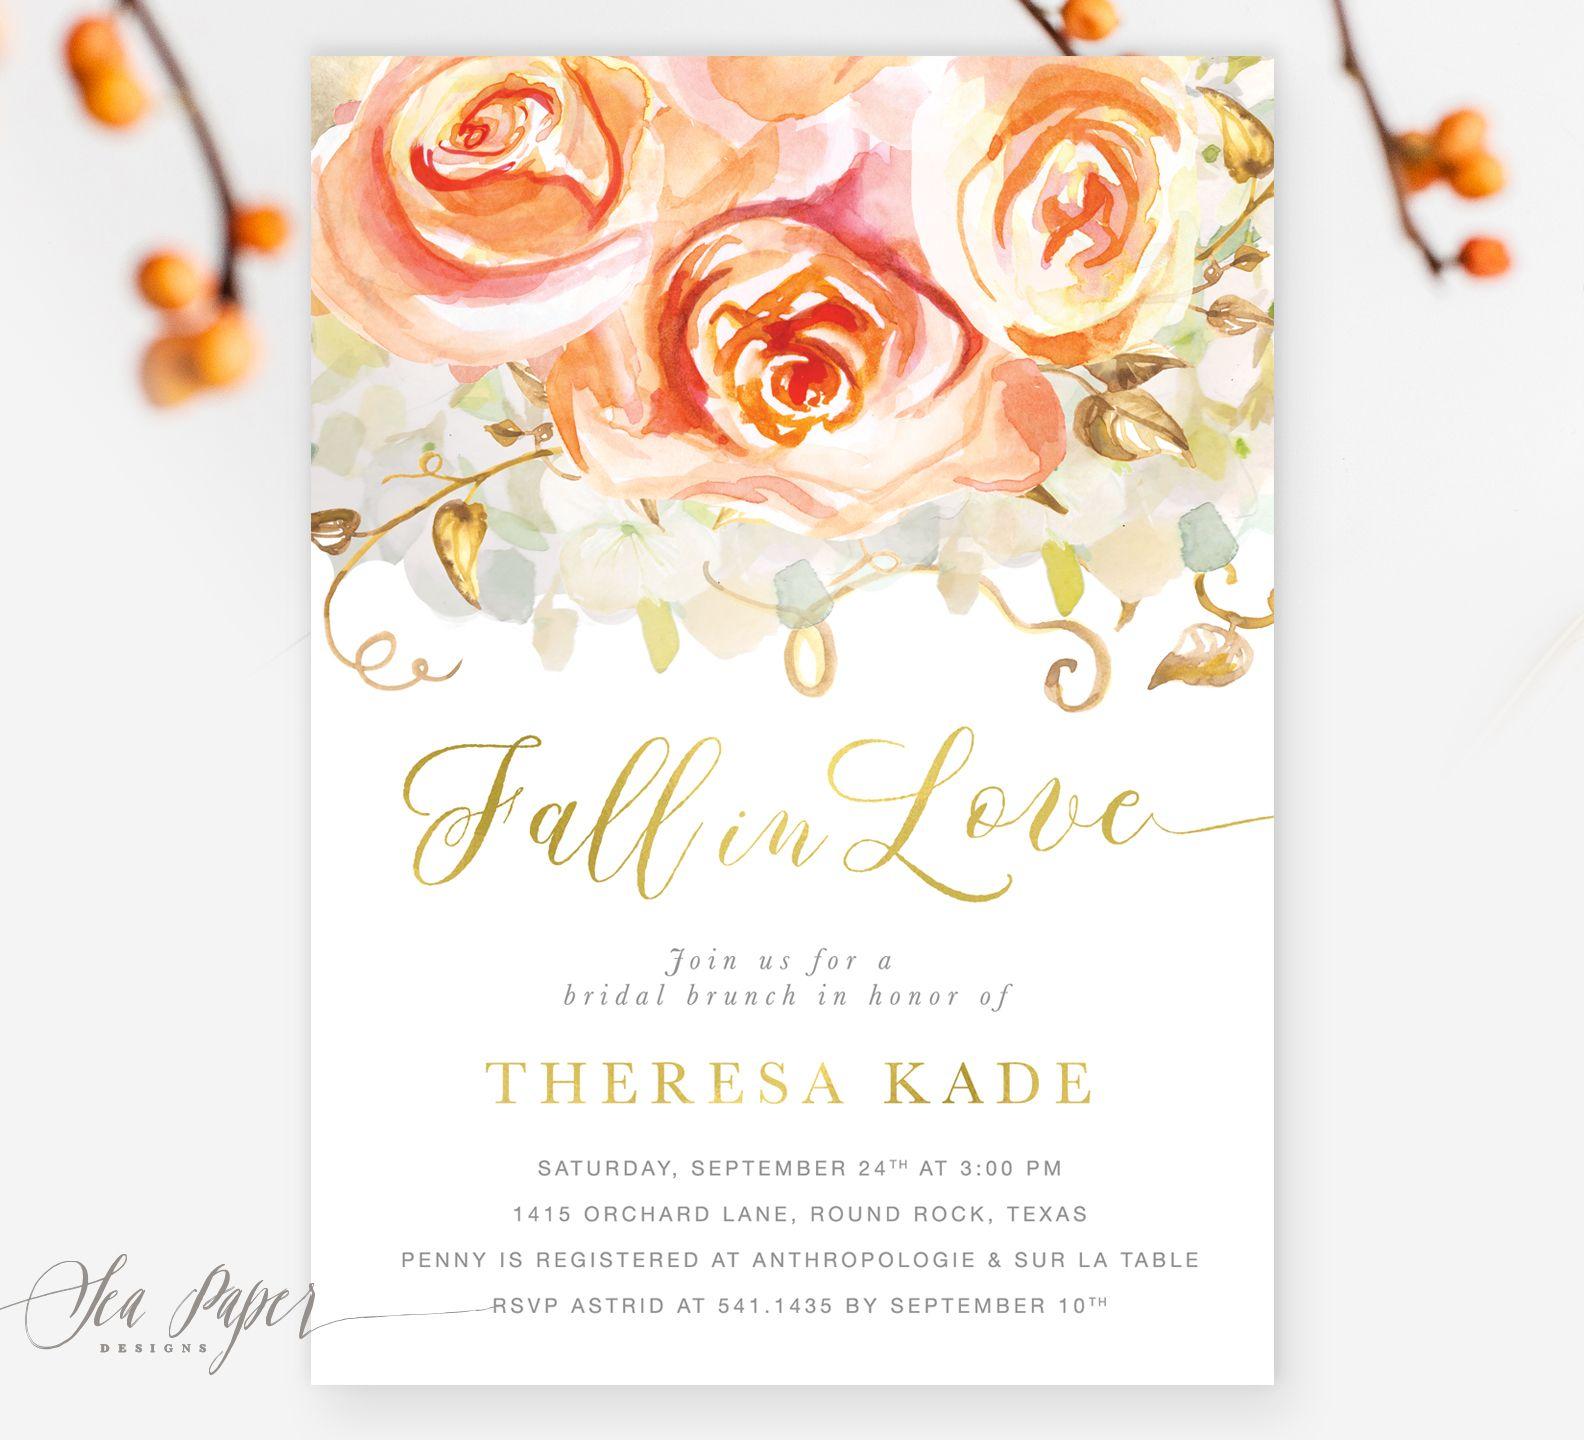 Fall in Love Peach Roses & Hydrangeas Bridal Shower Invitation ...